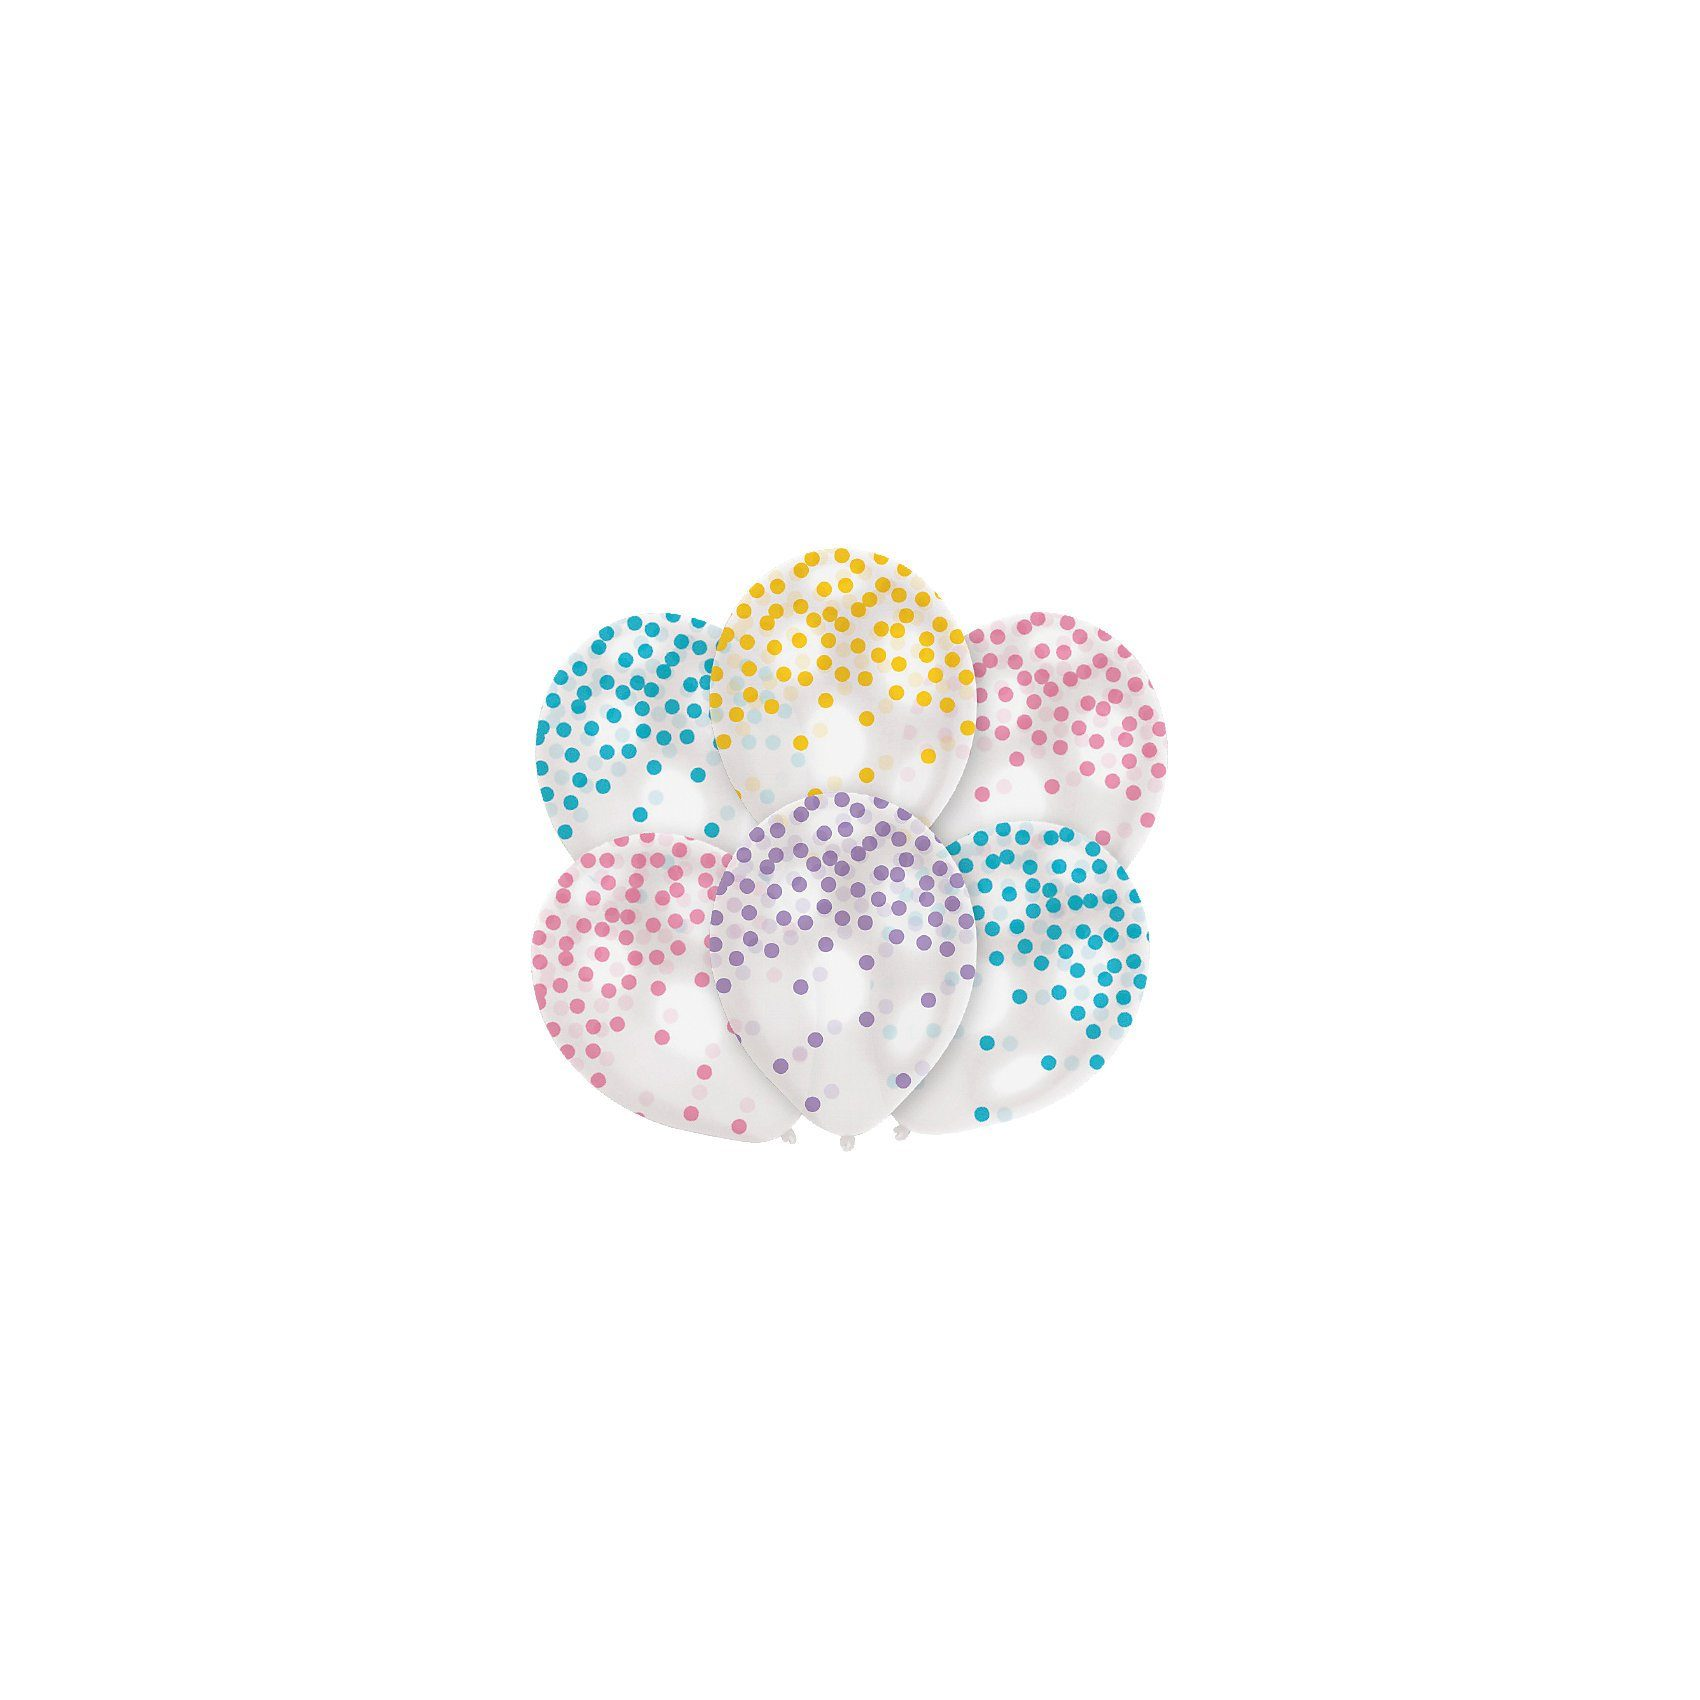 Amscan Luftballon Konfetti-Pastell, 6 Stück